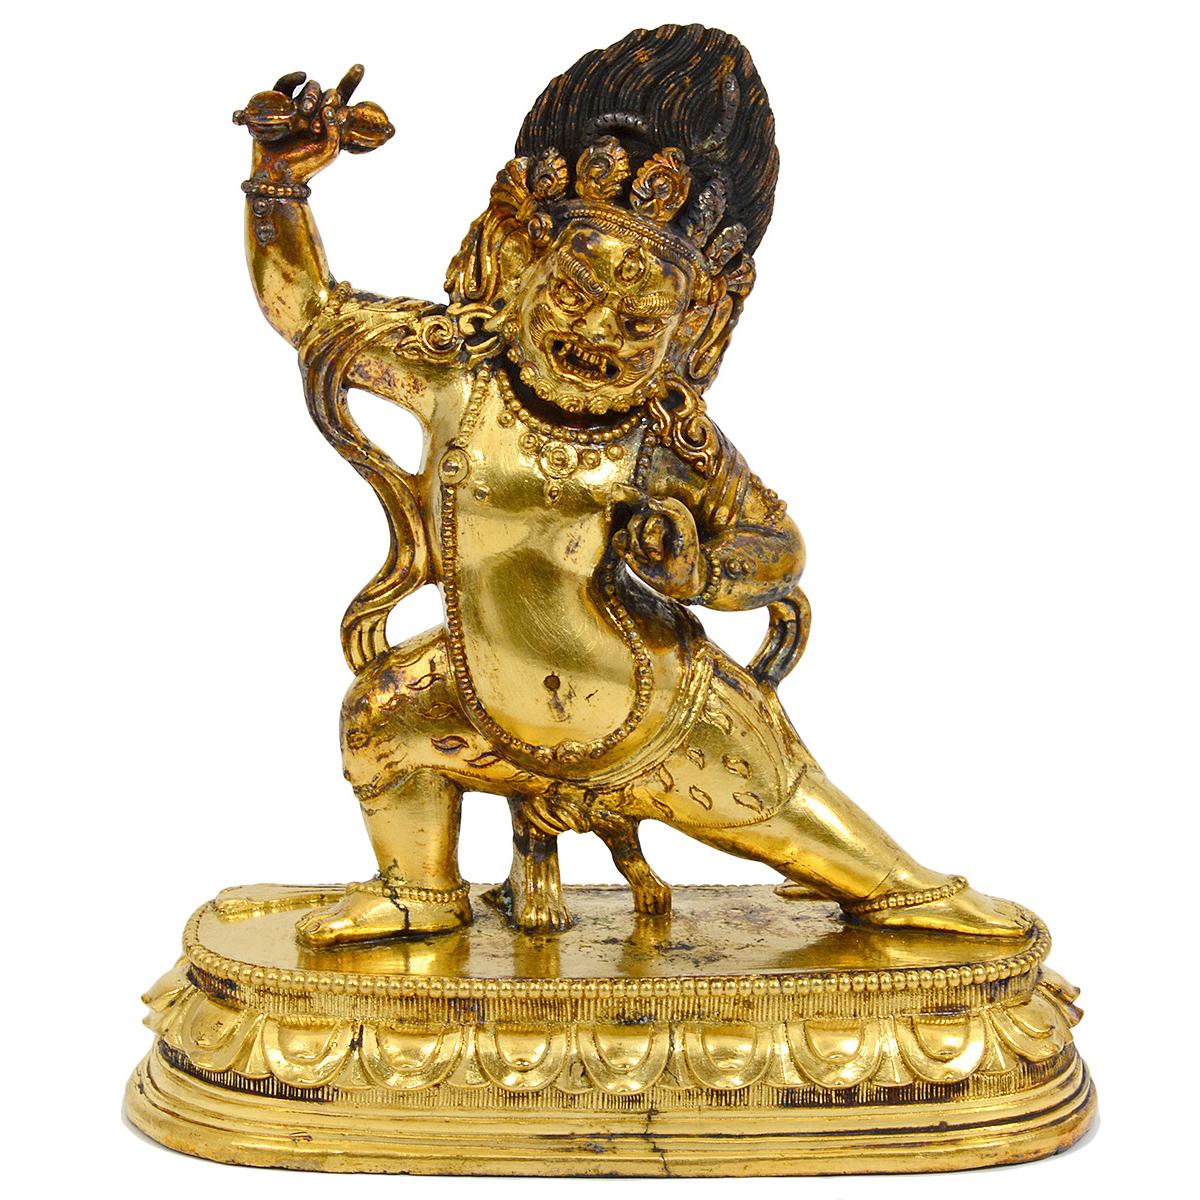 18th century Mongolian gilt bronze Vajrapani Bodhisattva. Auction Gallery of the Palm Beaches image